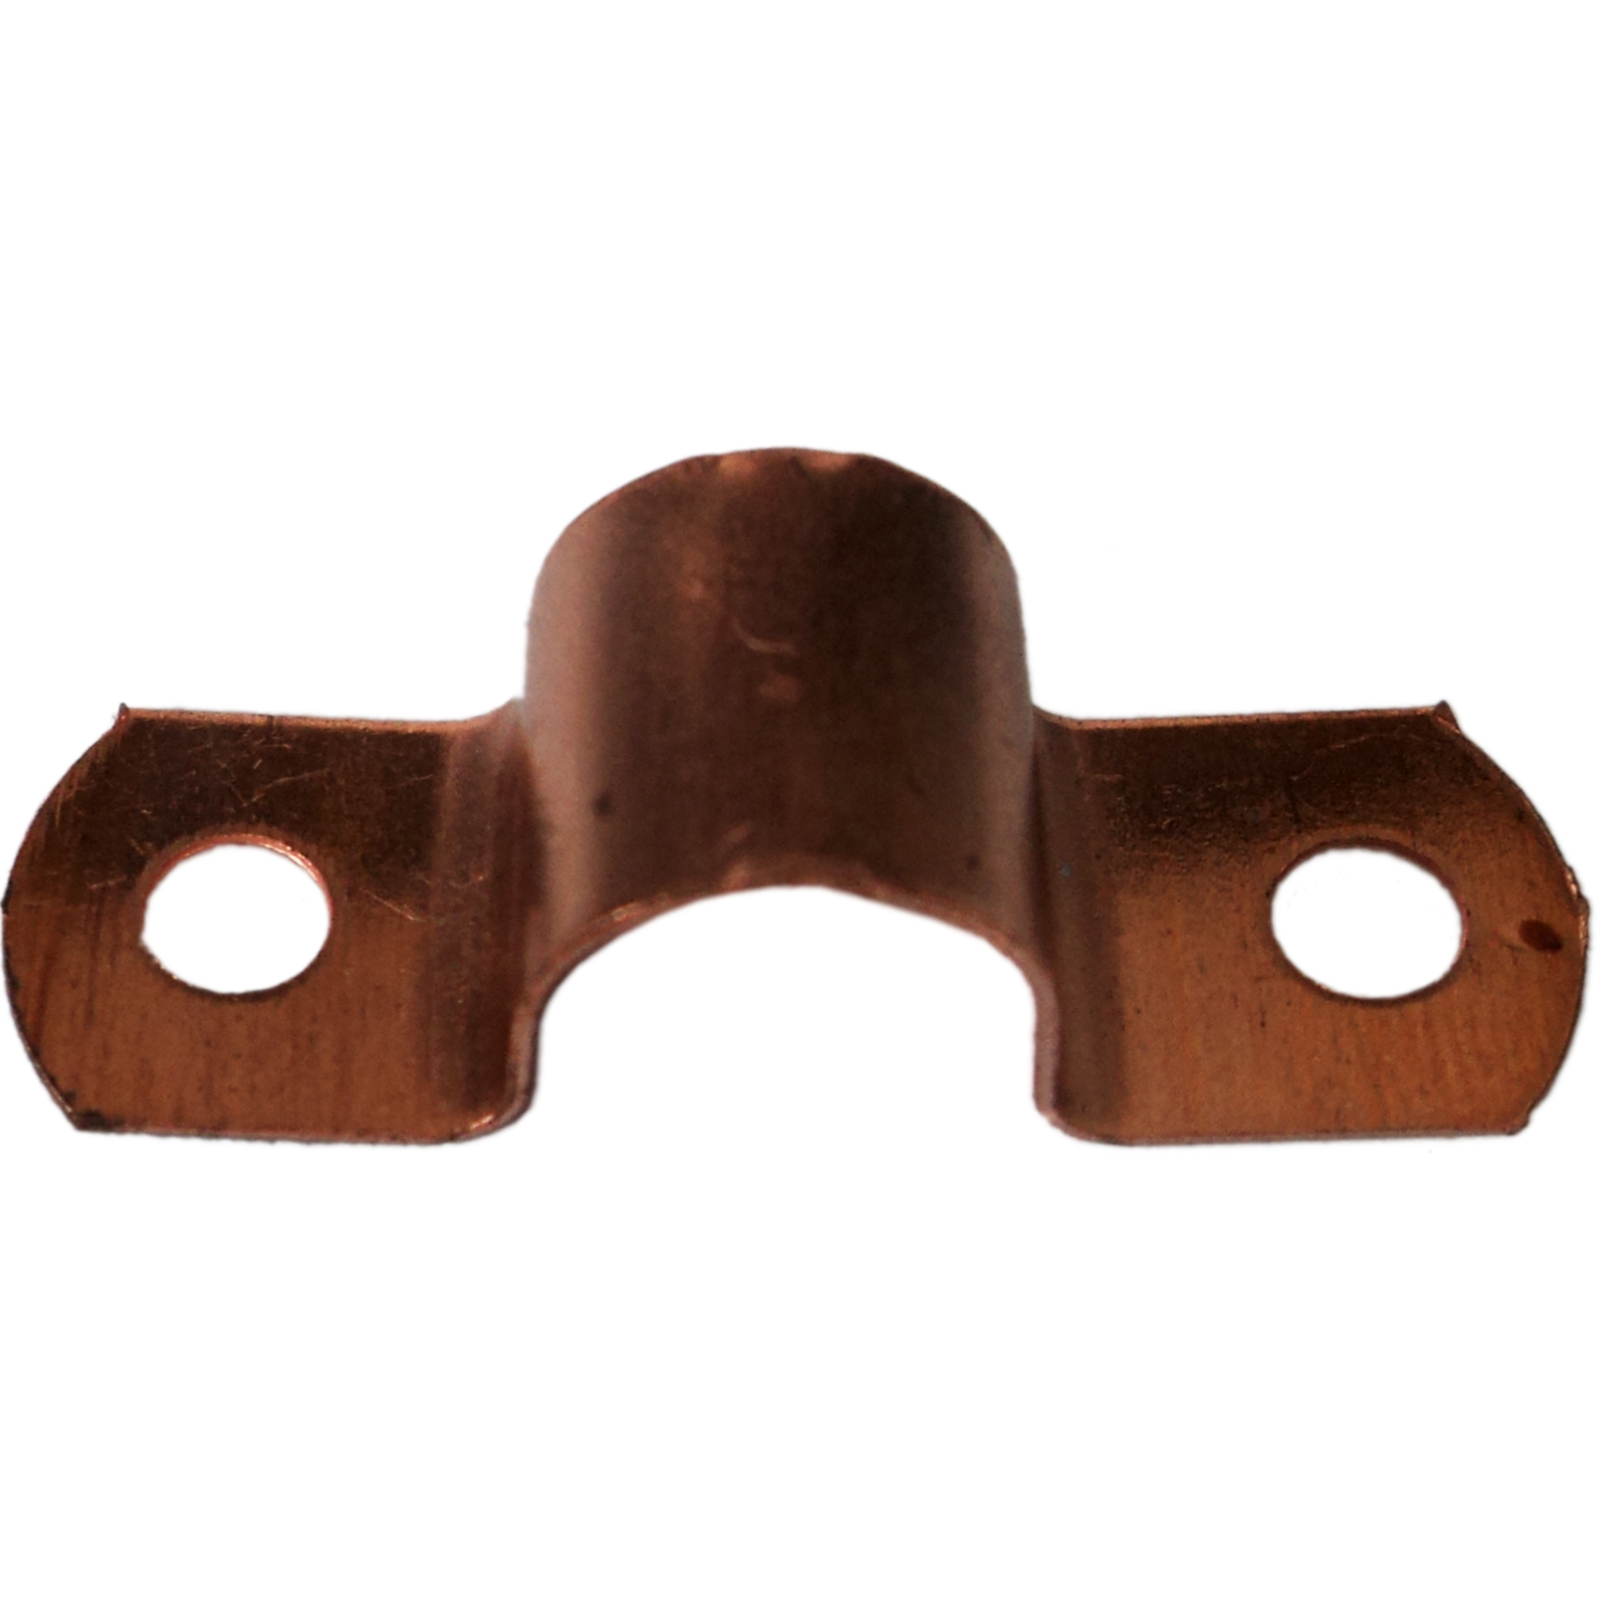 Copper Saddle Clips 6mm